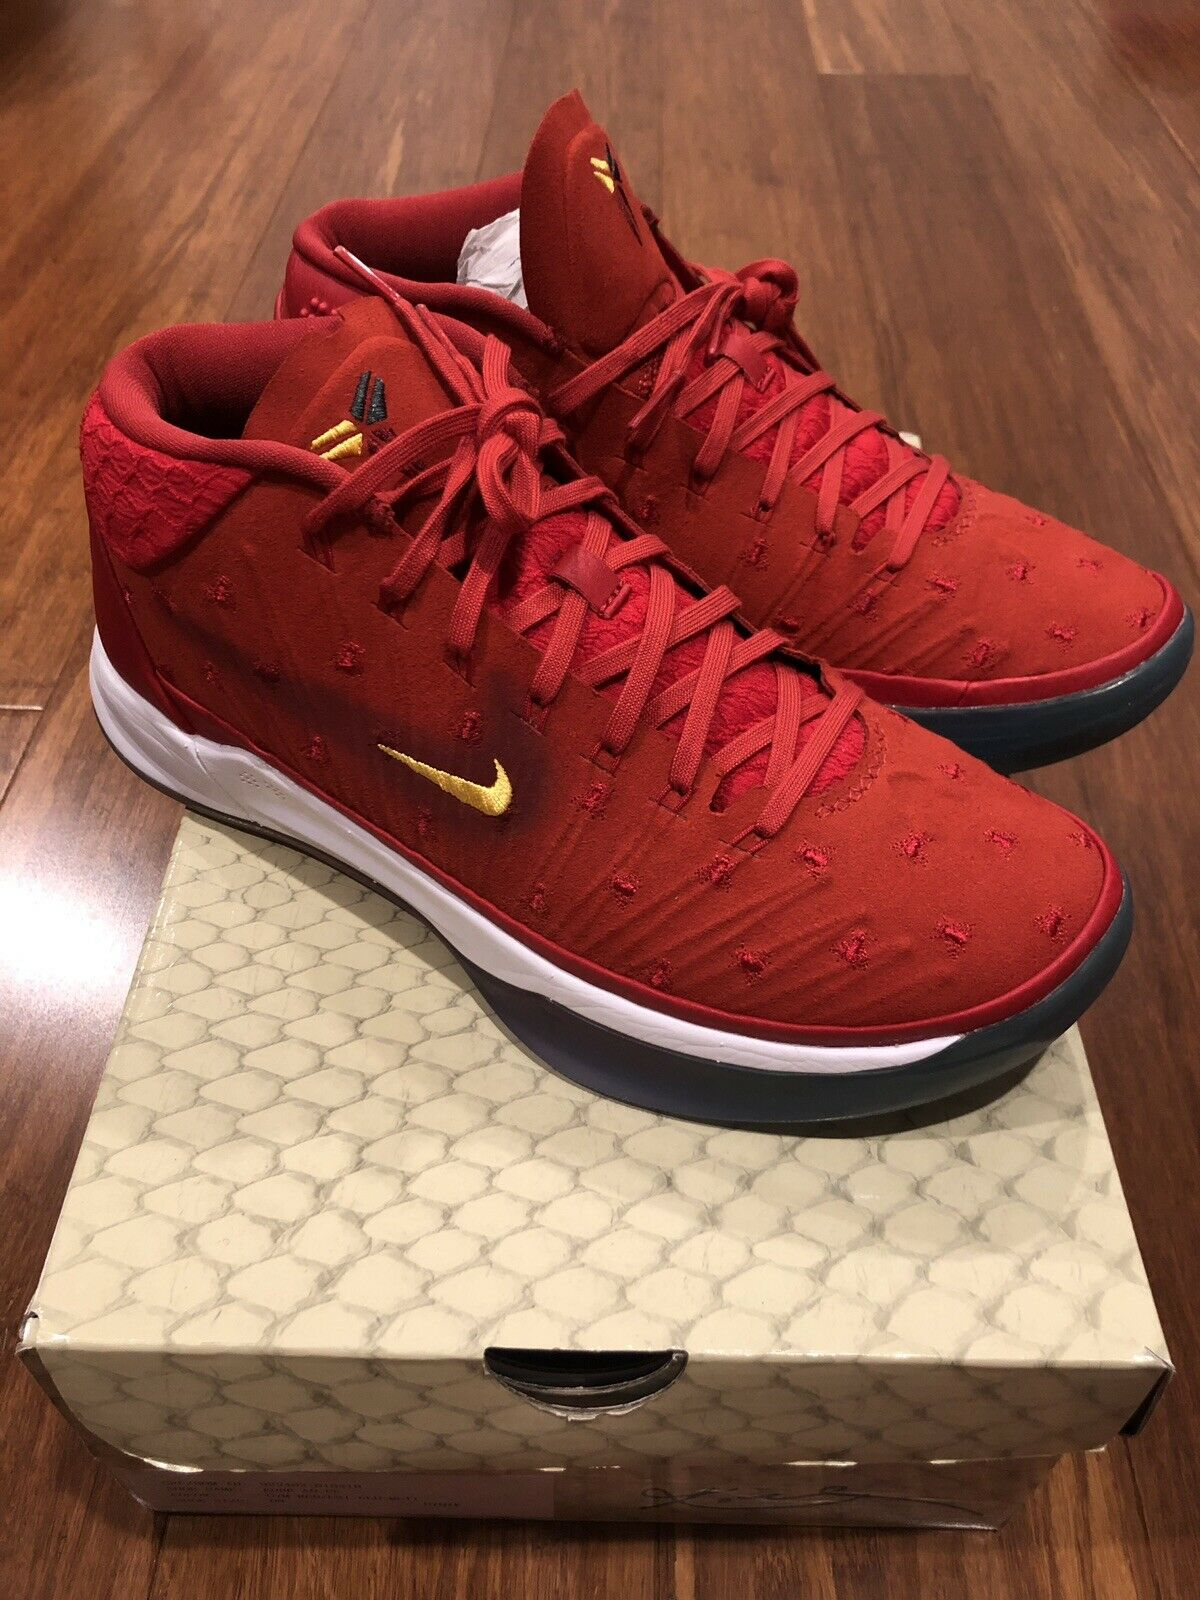 Nike Kobe AD PE Promo Sample Mens Size 8 AQ2721 600 GYM RED UNIV gold-MULTI